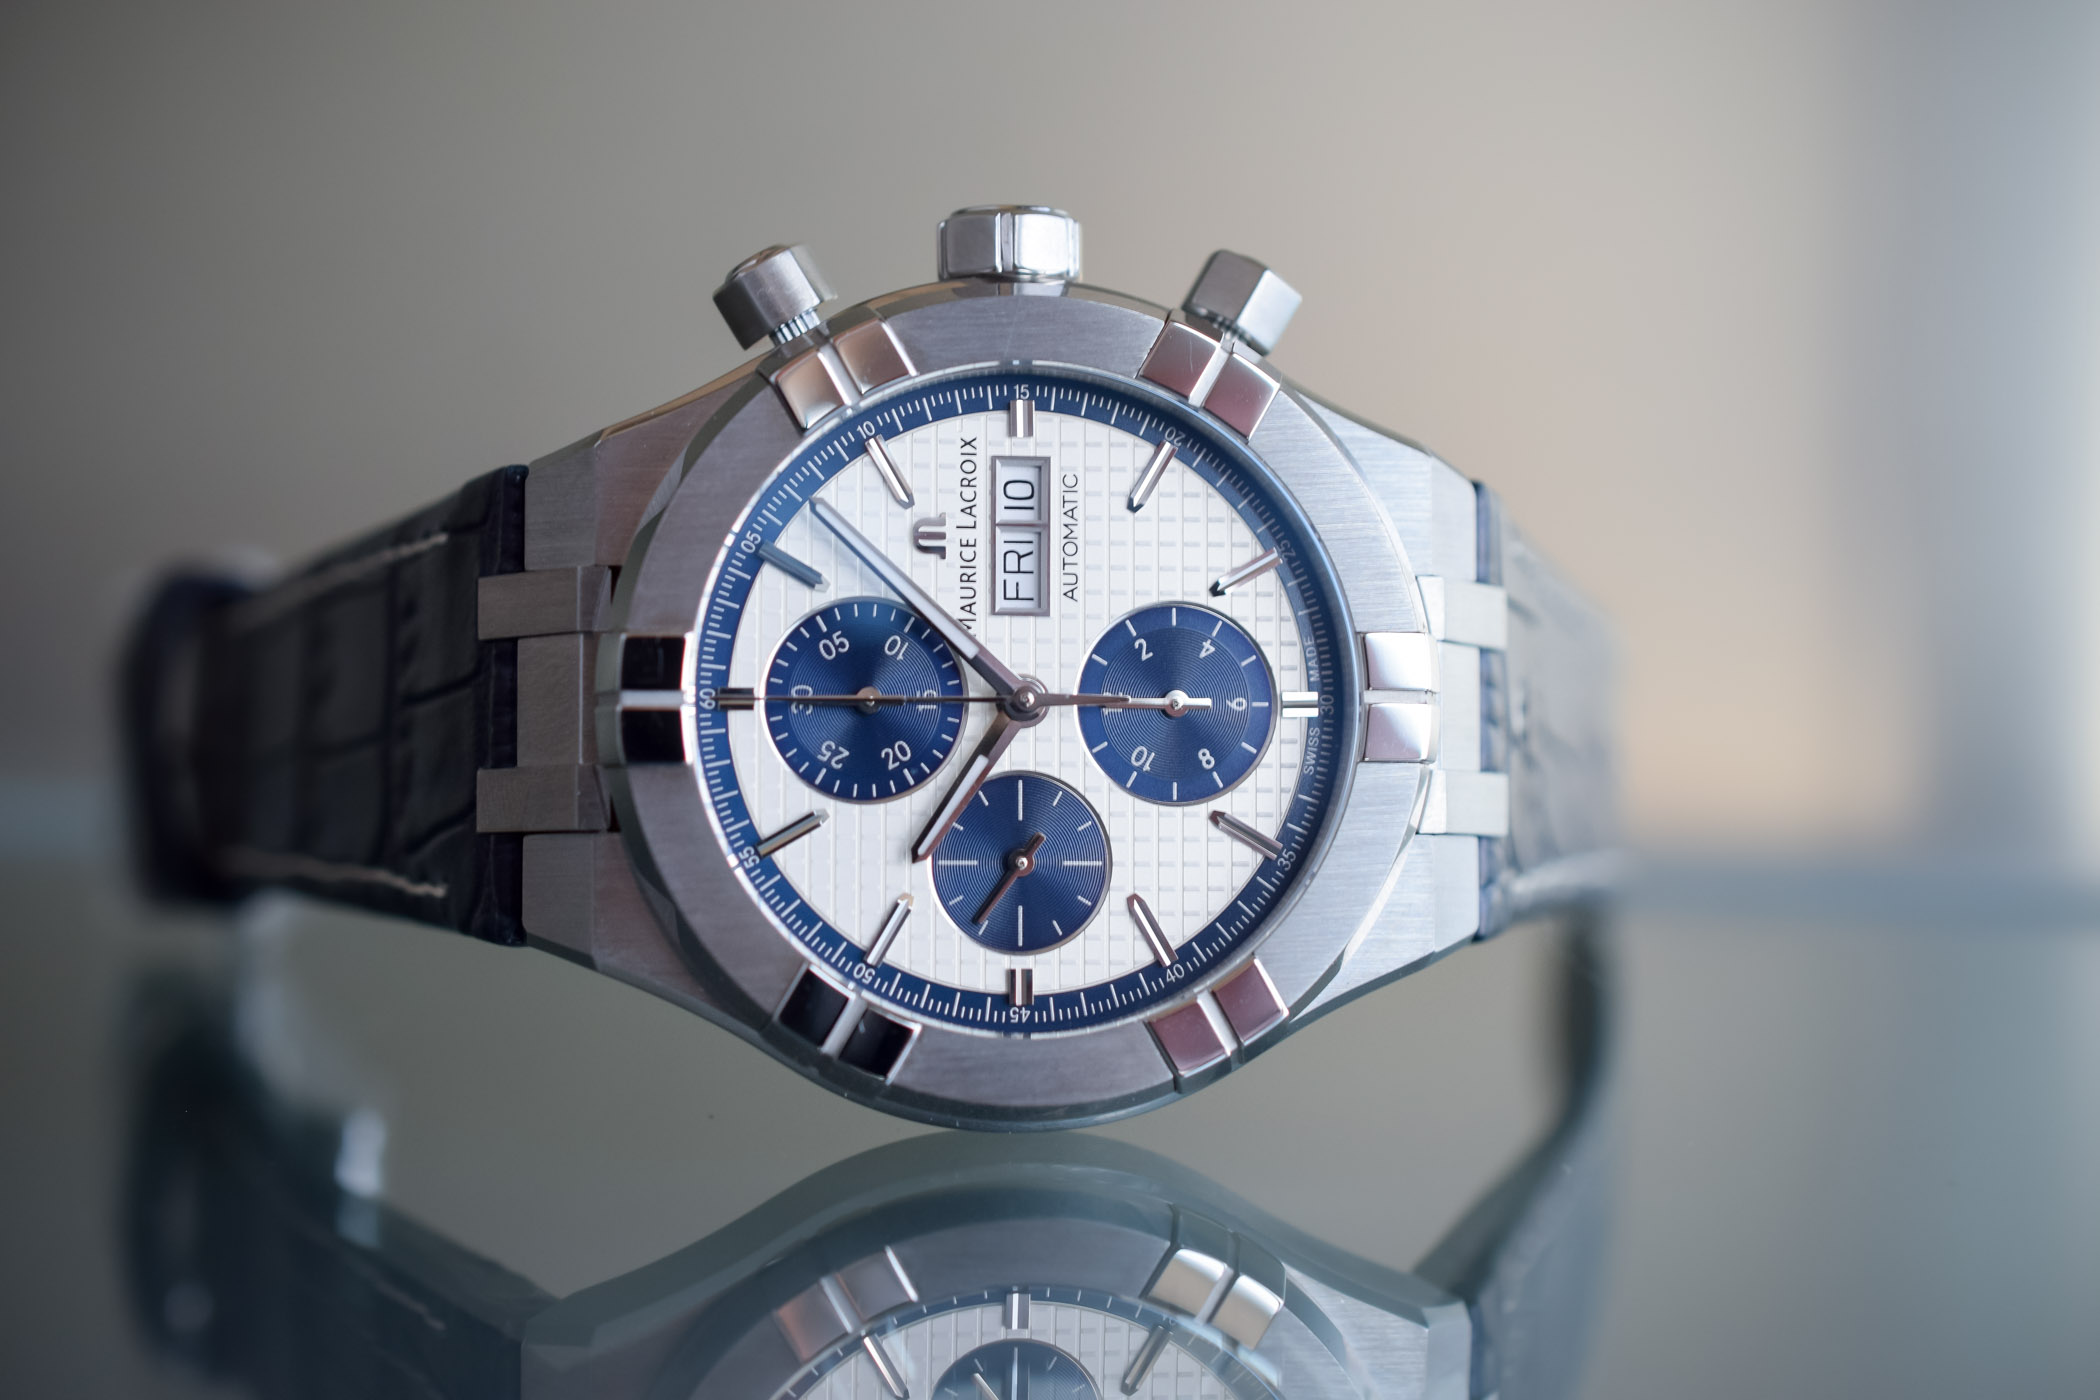 Maurice Lacroix Aikon Automatic chronograph - Baselworld 2018 - 14